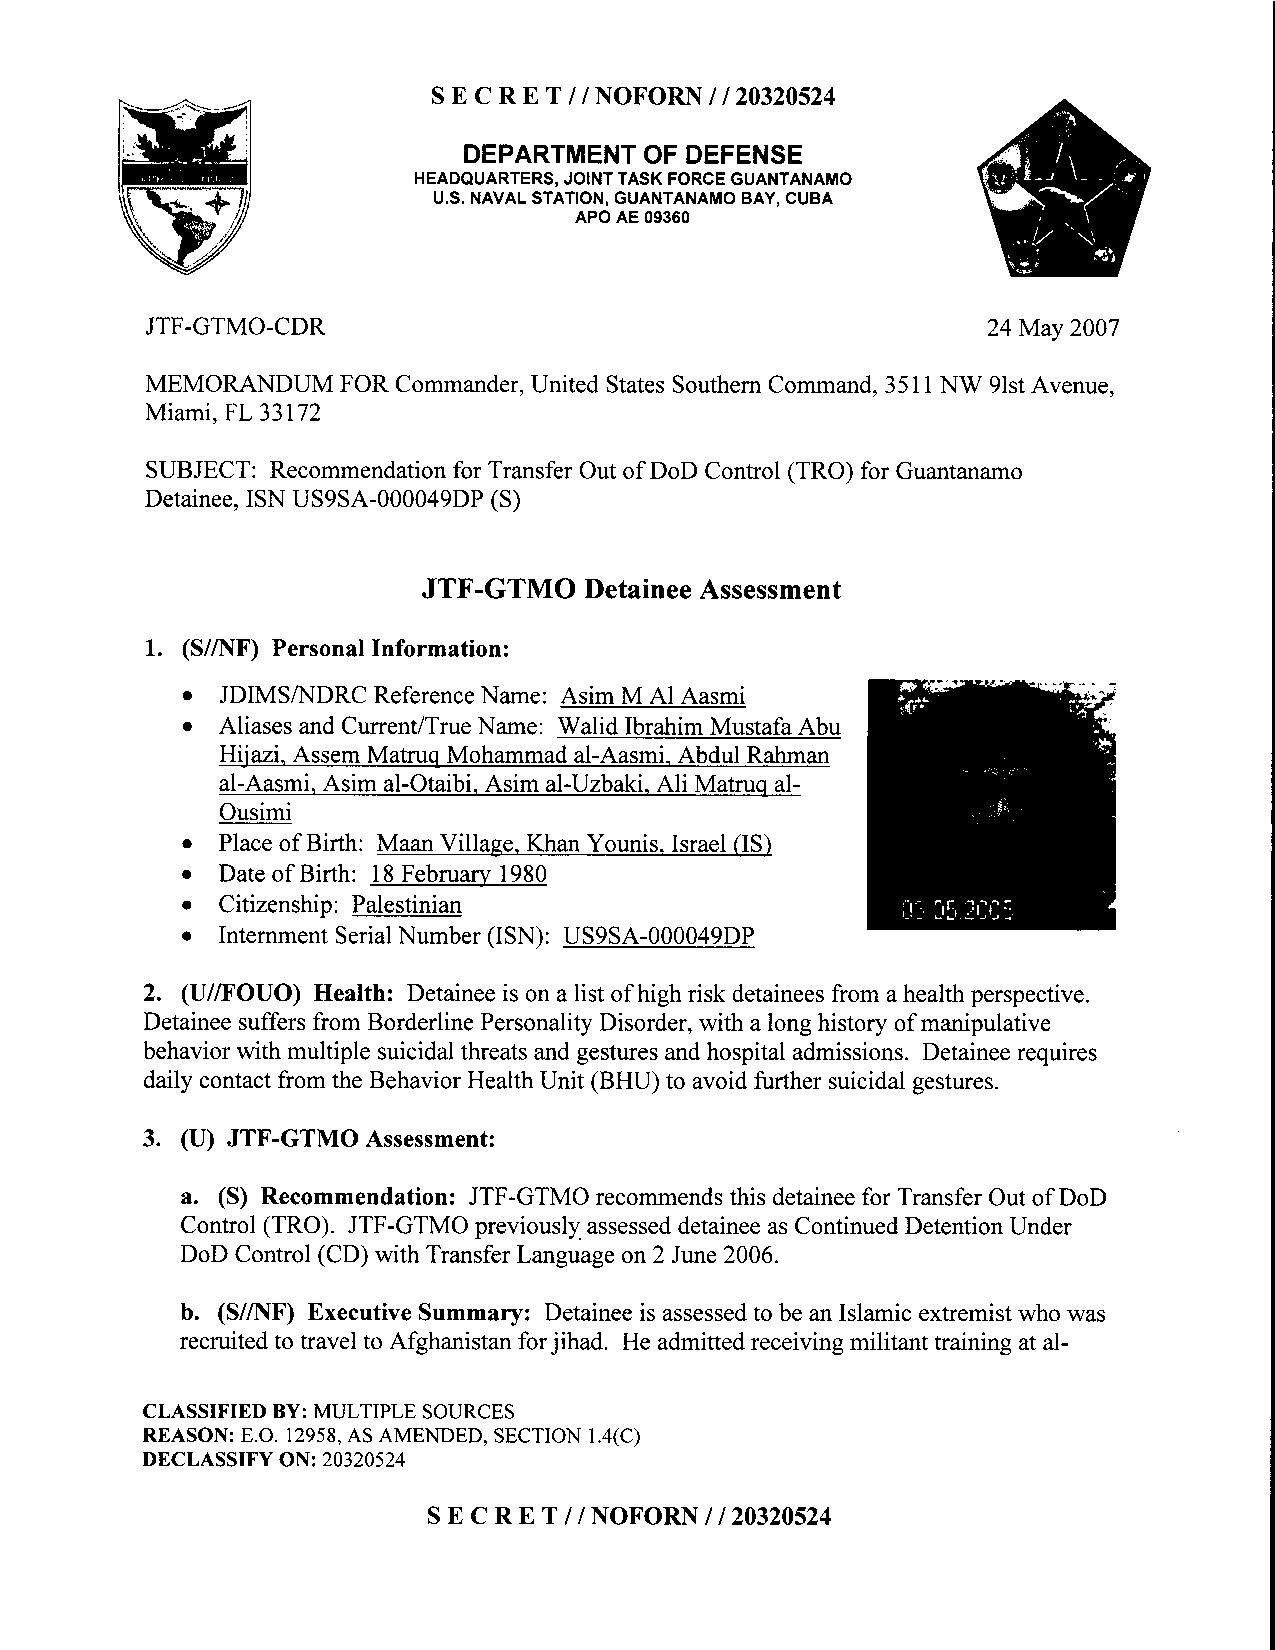 ISN 00049, Asim M Al Aasmi's Guantanamo detainee assessment.pdf